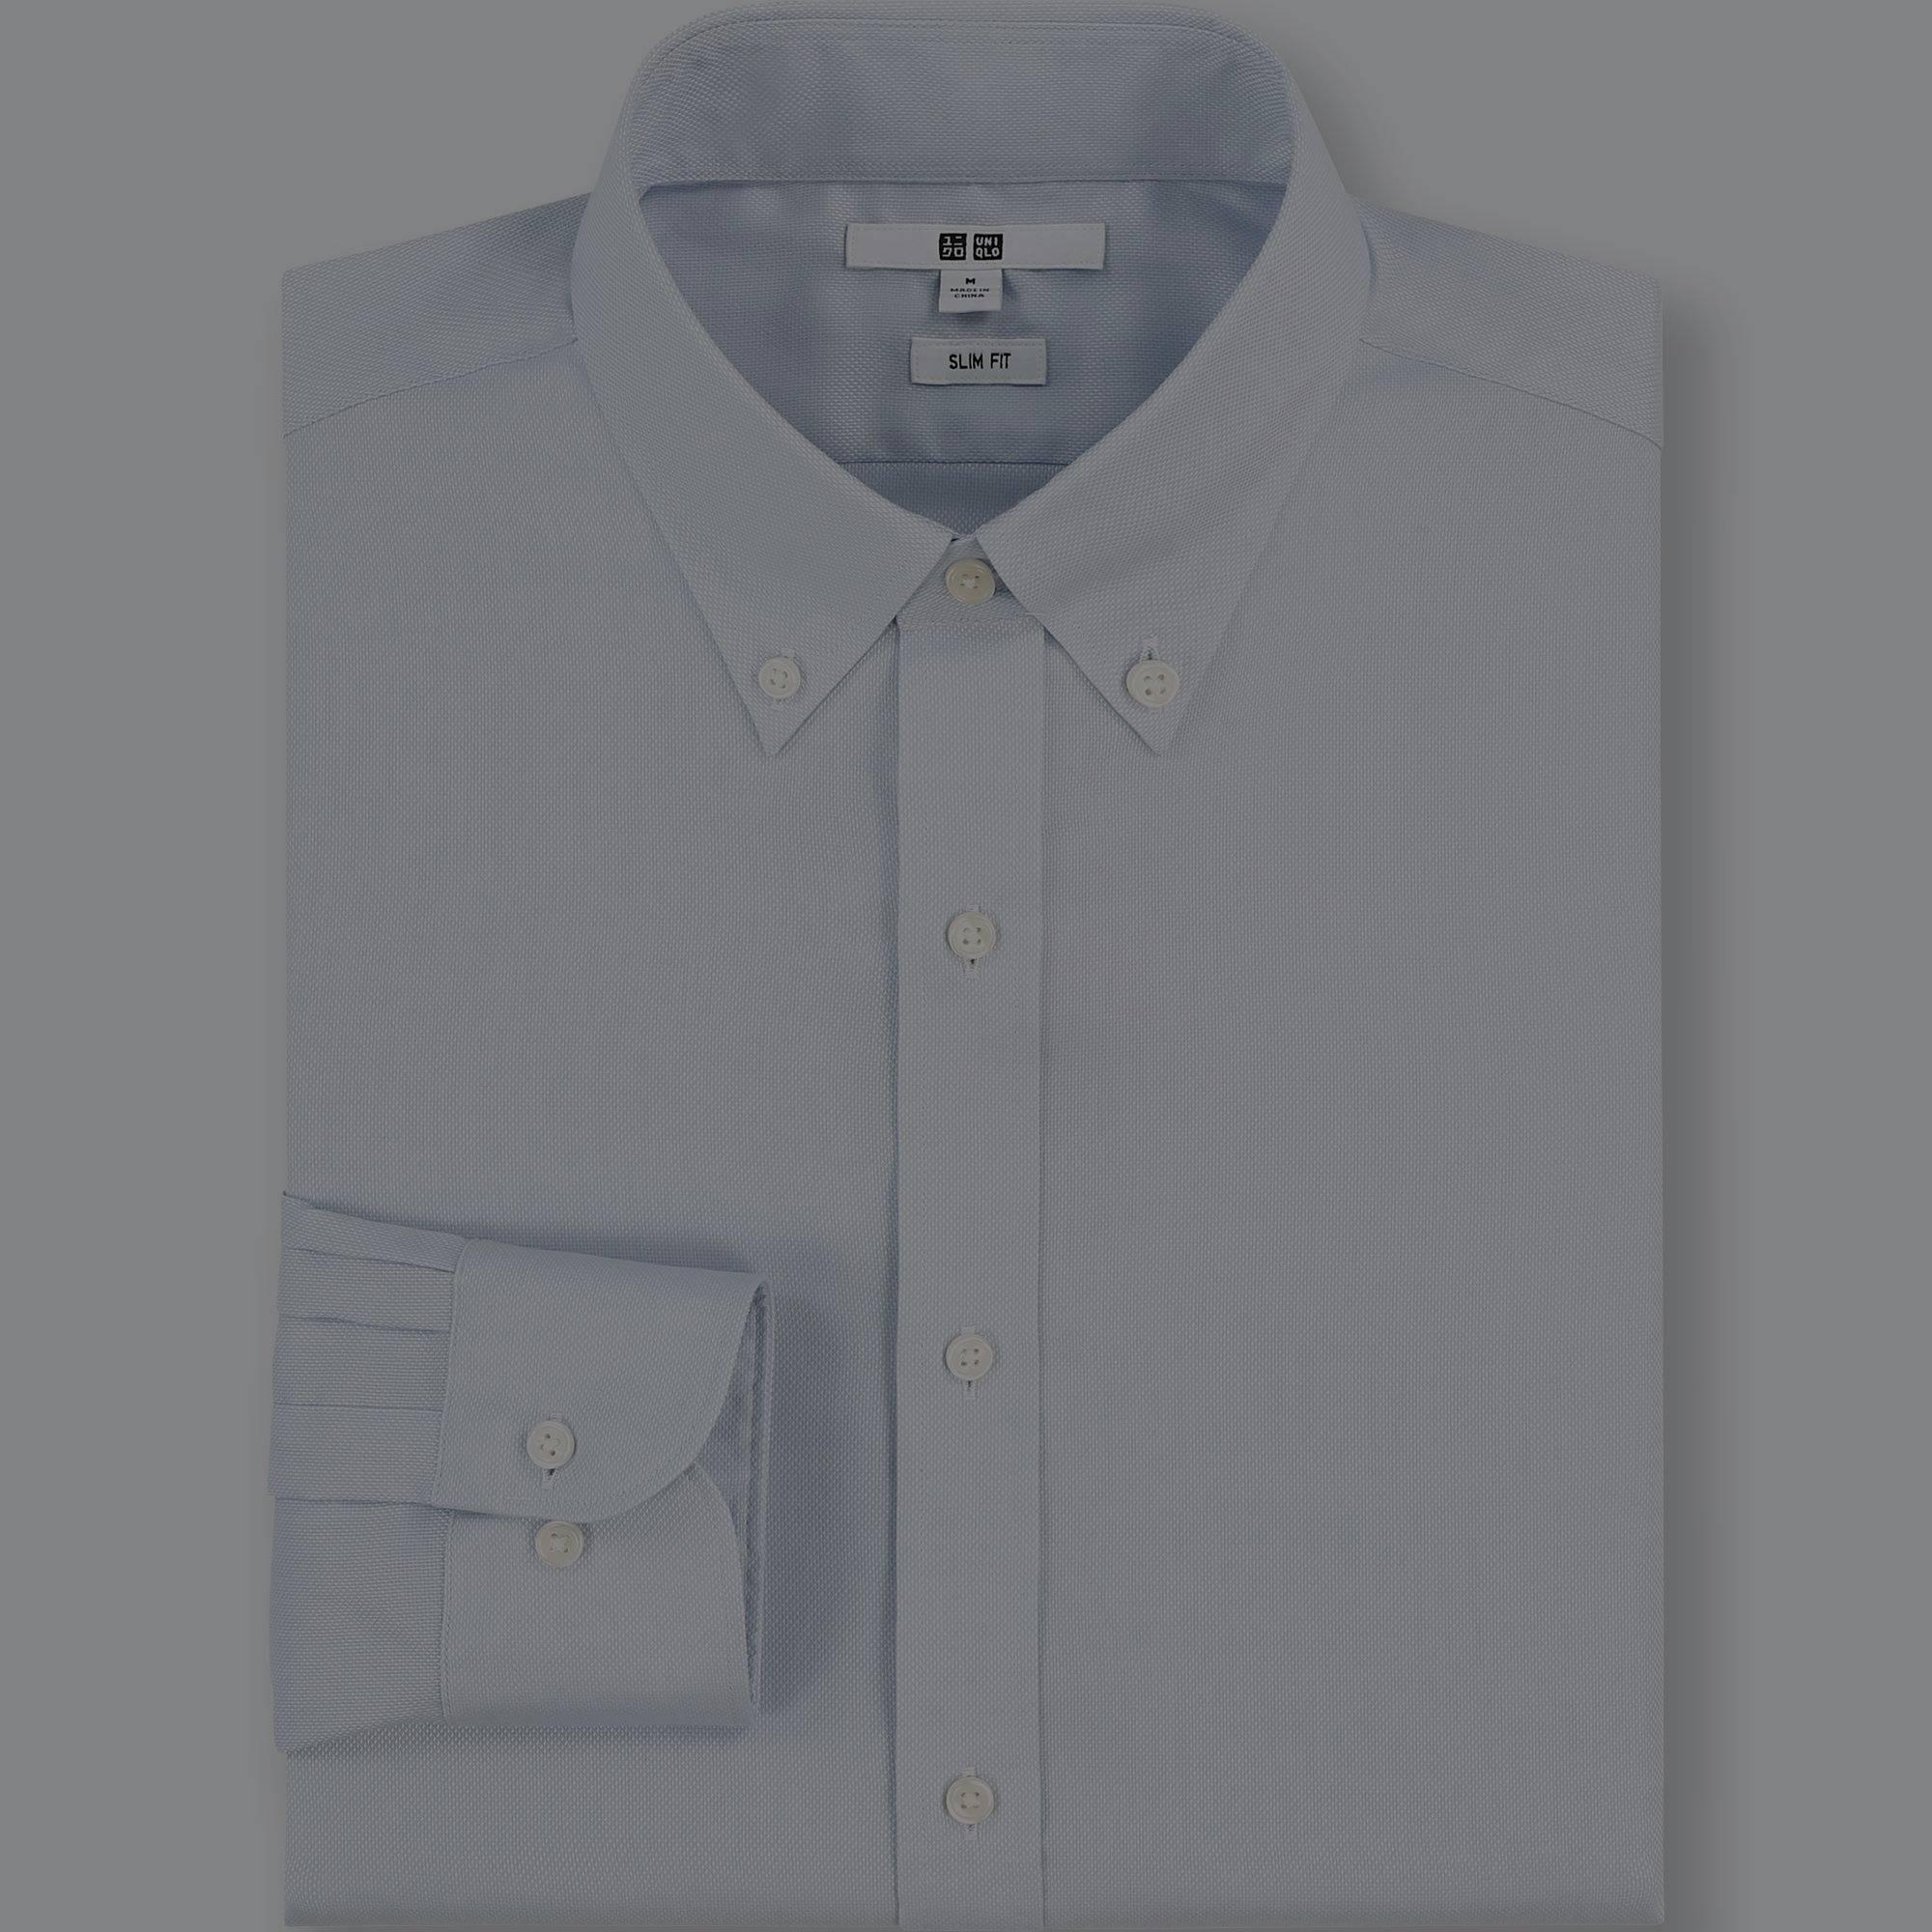 Custom Fit Uniqlo Shirts - $29.90